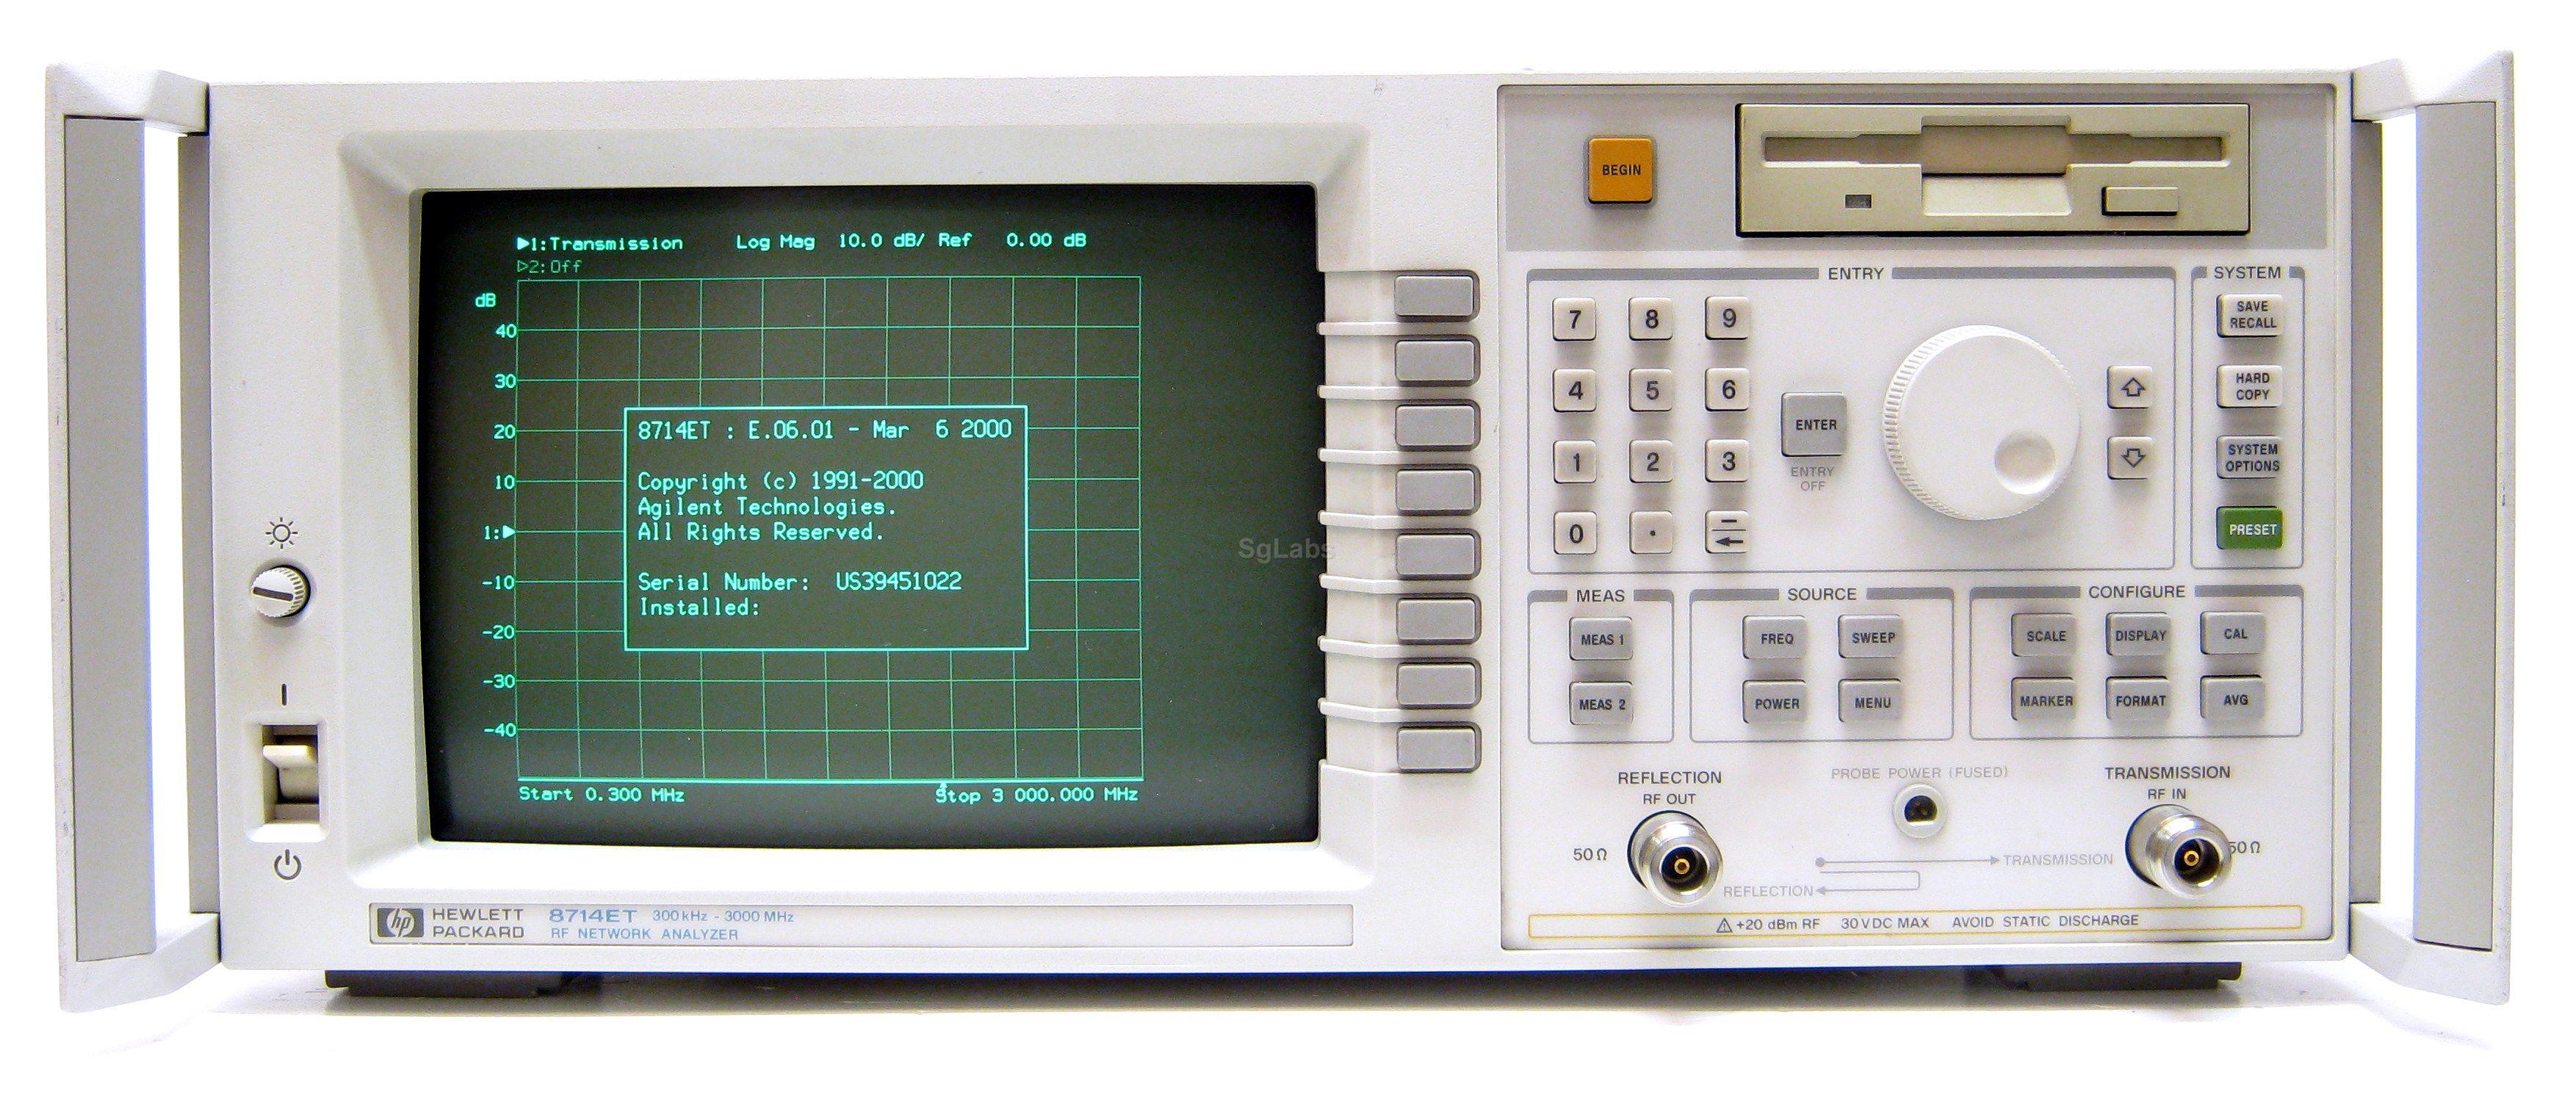 Image of Keysight-Technologies-Agilent-HP-8714ET by SAMBOW ADTECH Co.,Ltd.